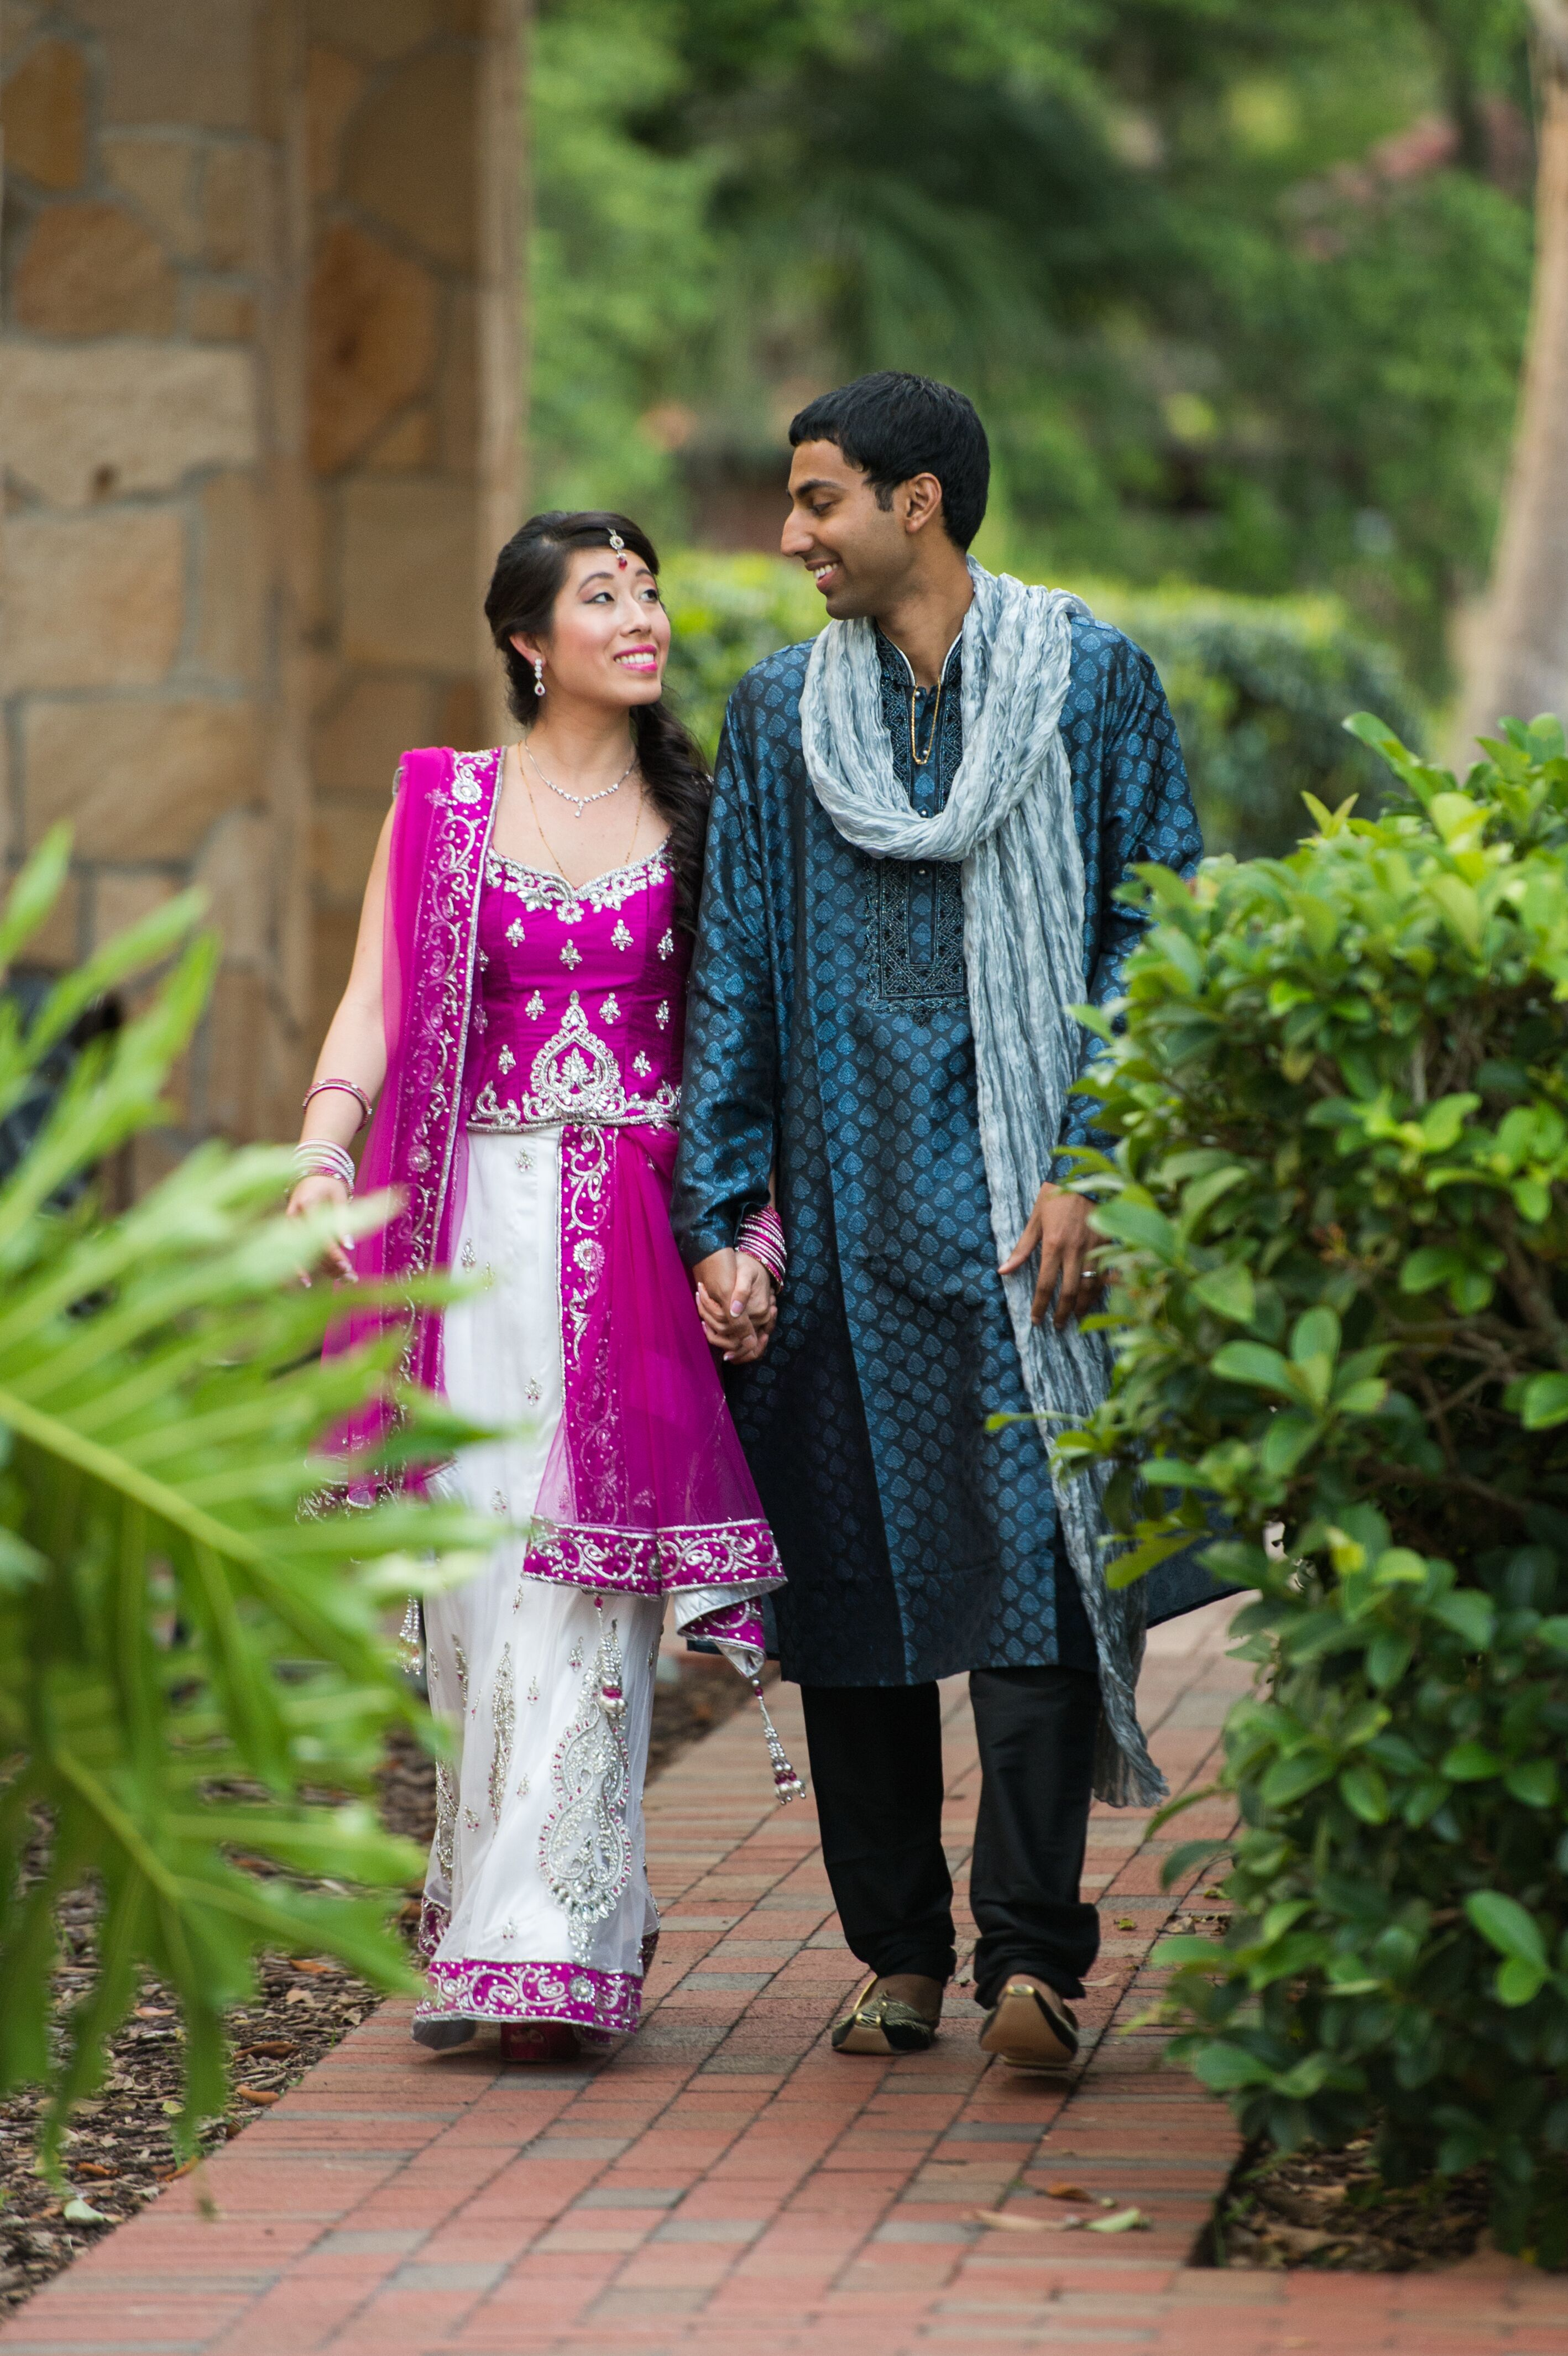 Chinese Women Love Indian Men